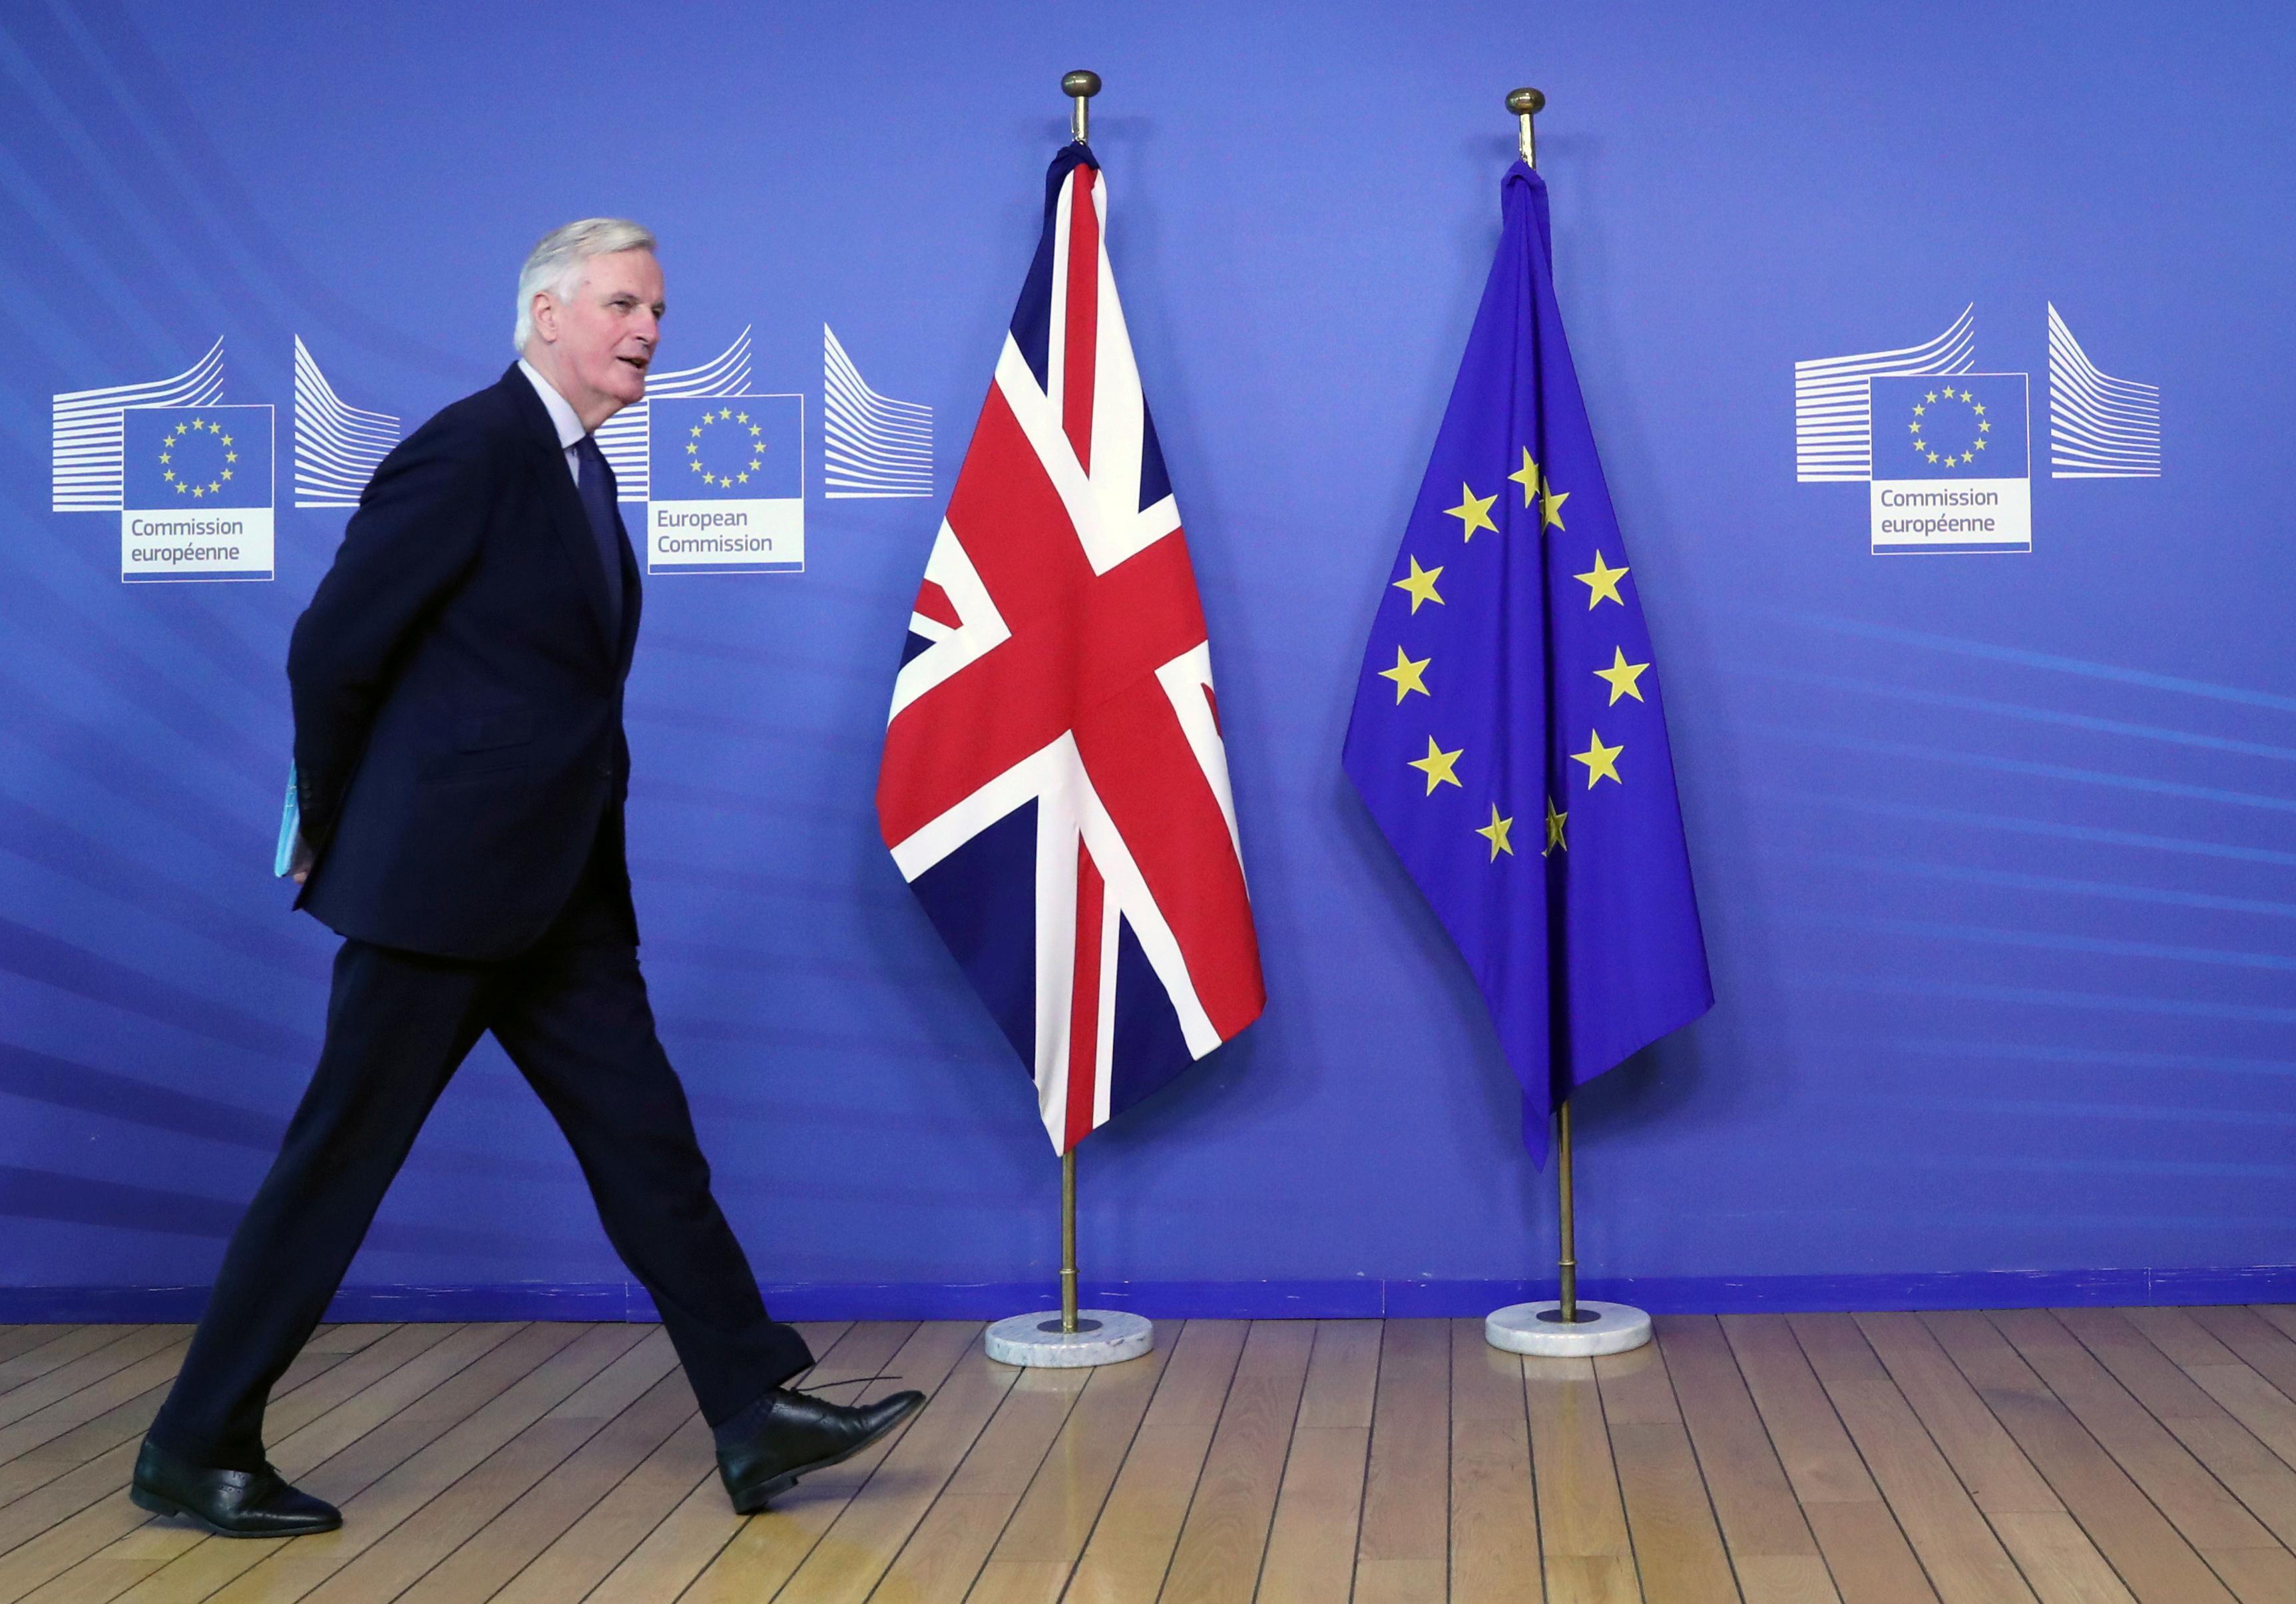 EU's Barnier rules out Brexit deal renegotiation - paper